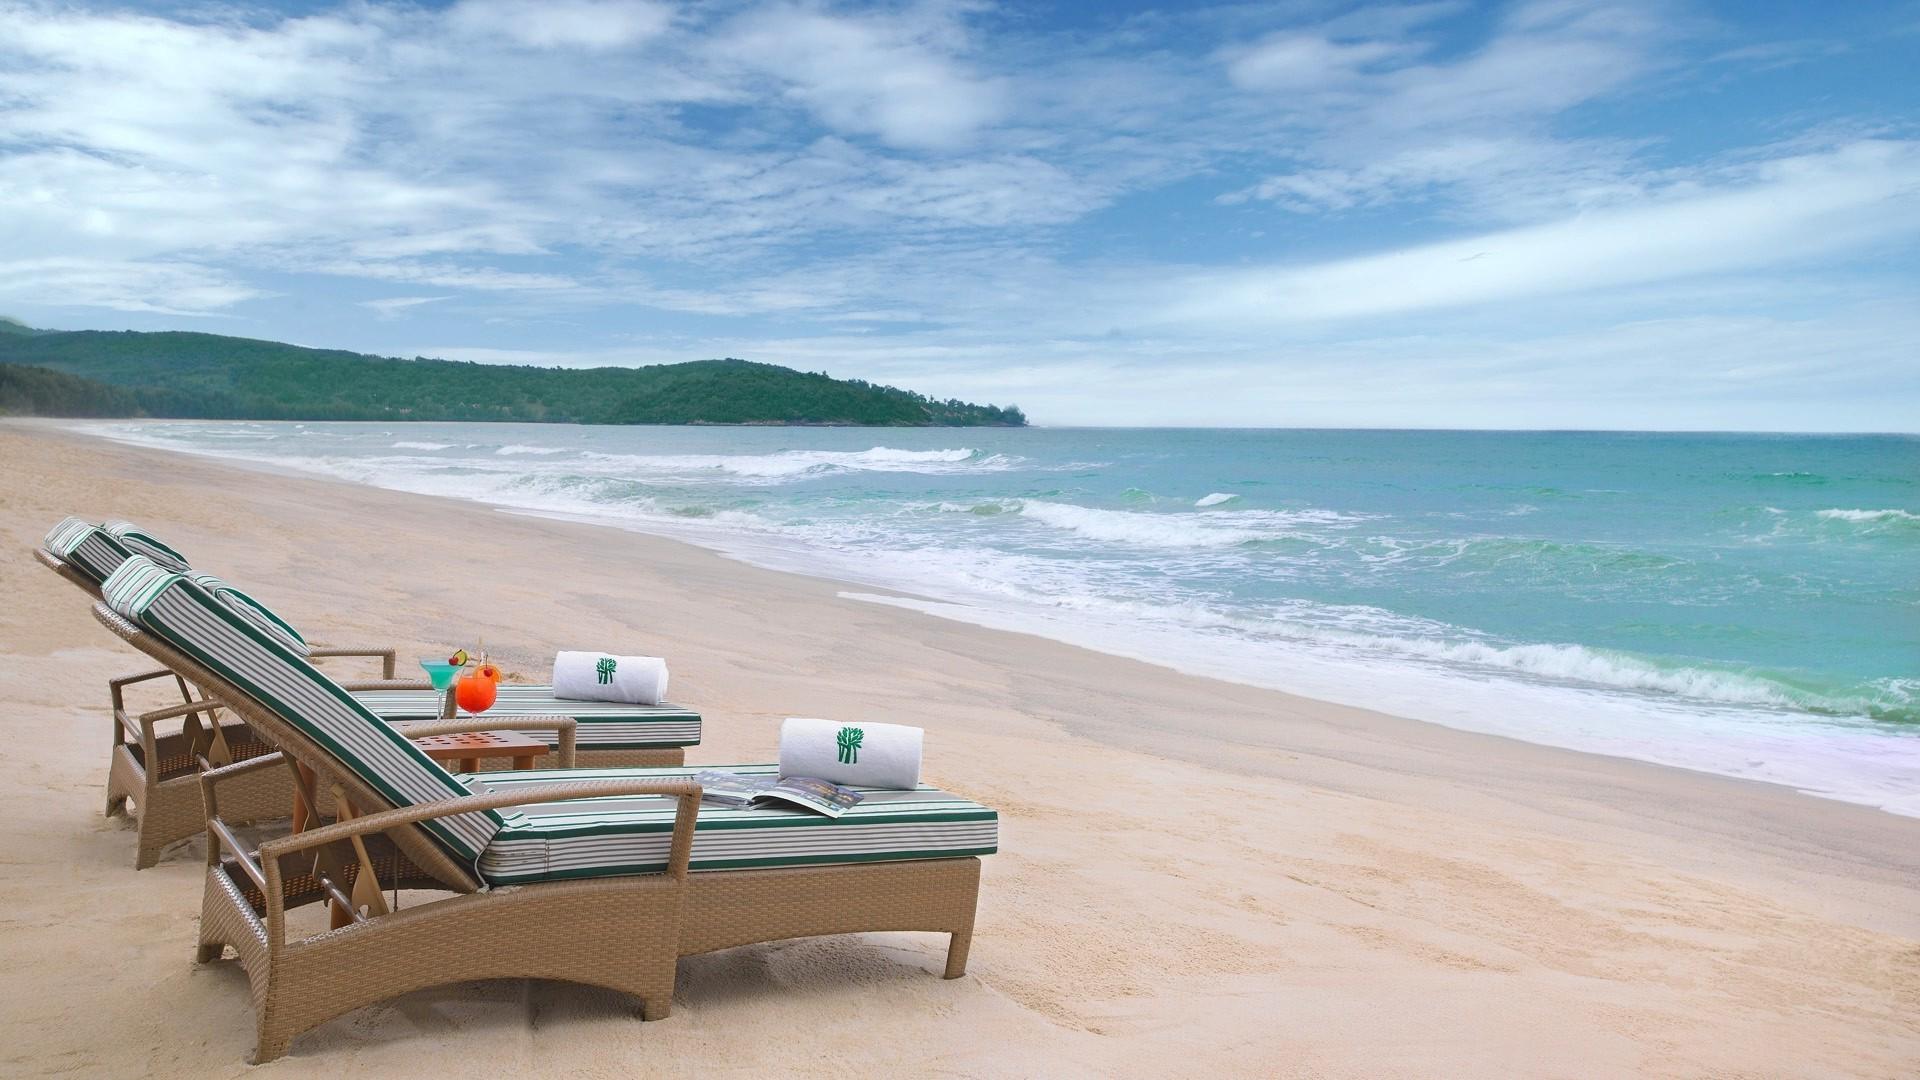 1920x1080 Px Beach Chair Clouds Drink Hill Landscape Nature Sand Sea Summer  Tropical